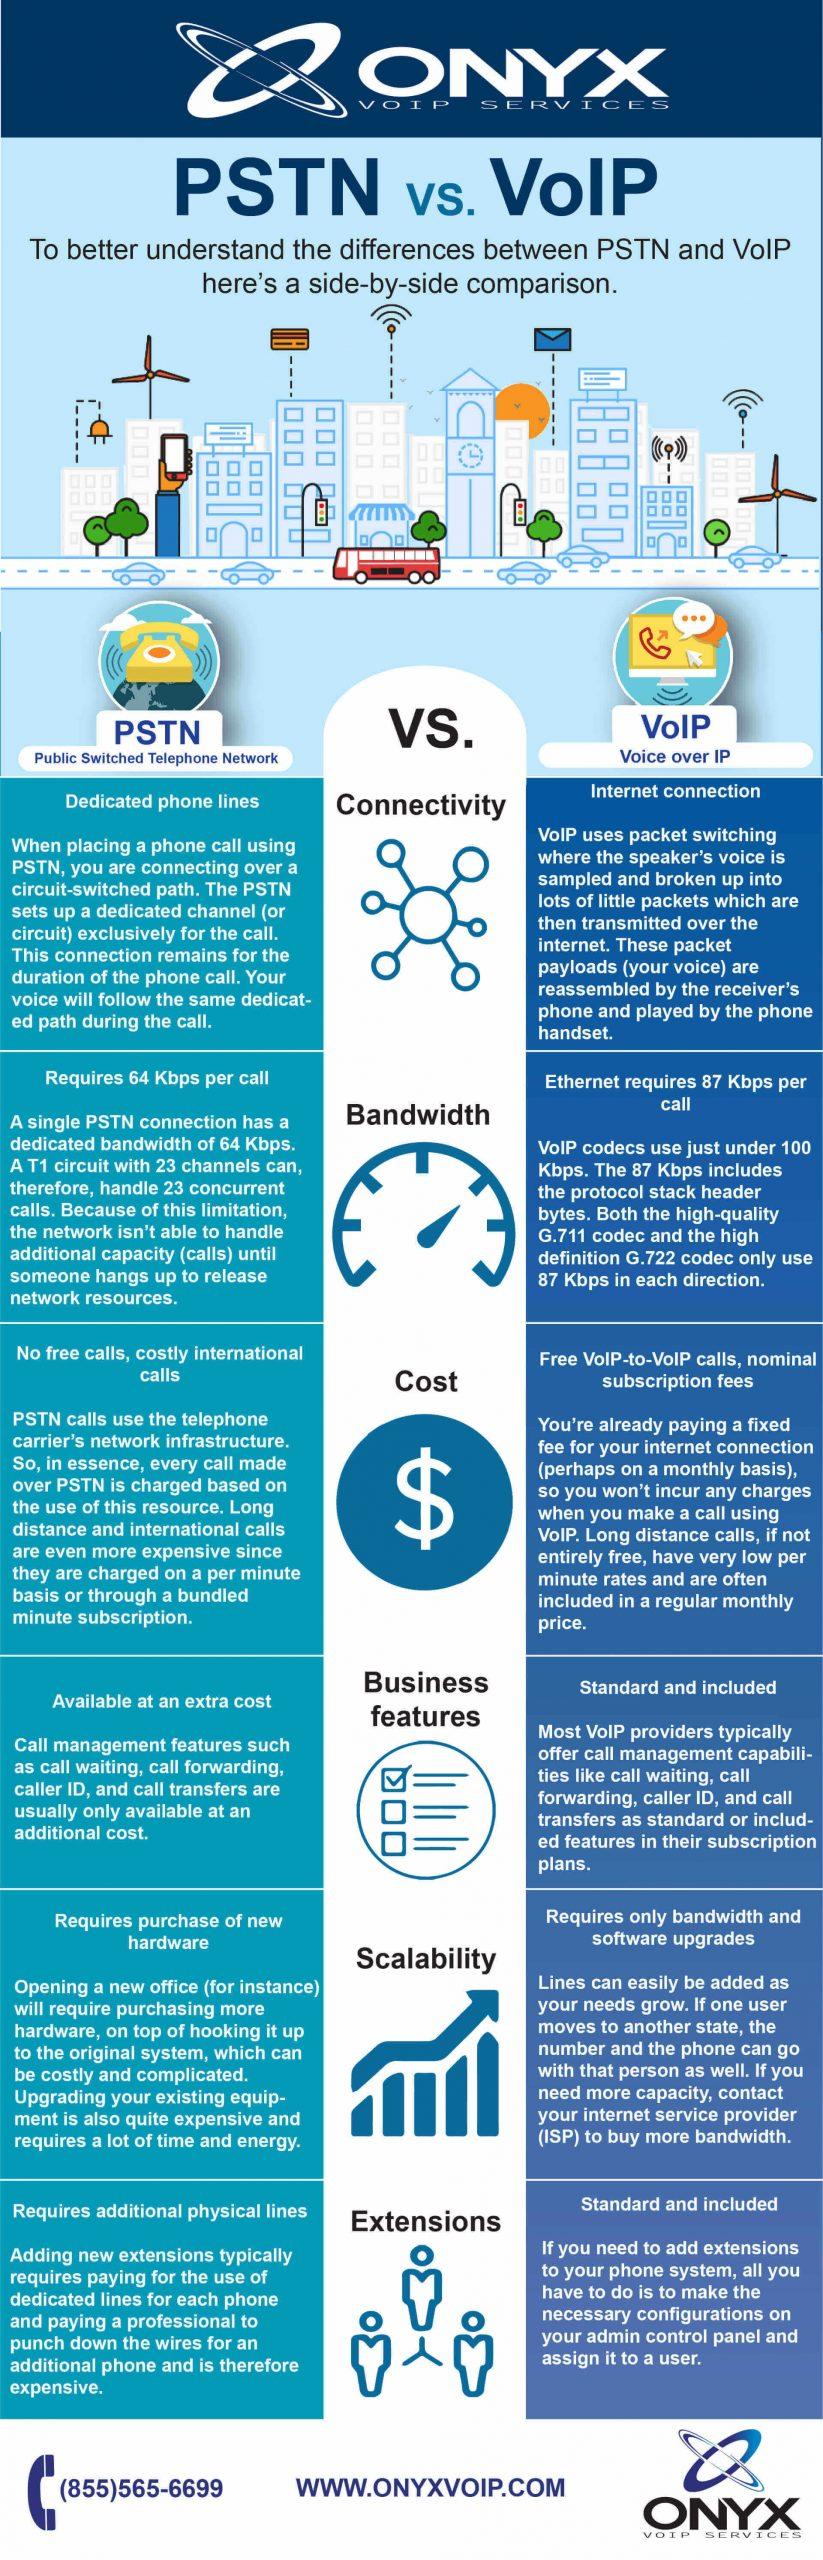 infographic-VoIP-communications-vs-PSTN-communications